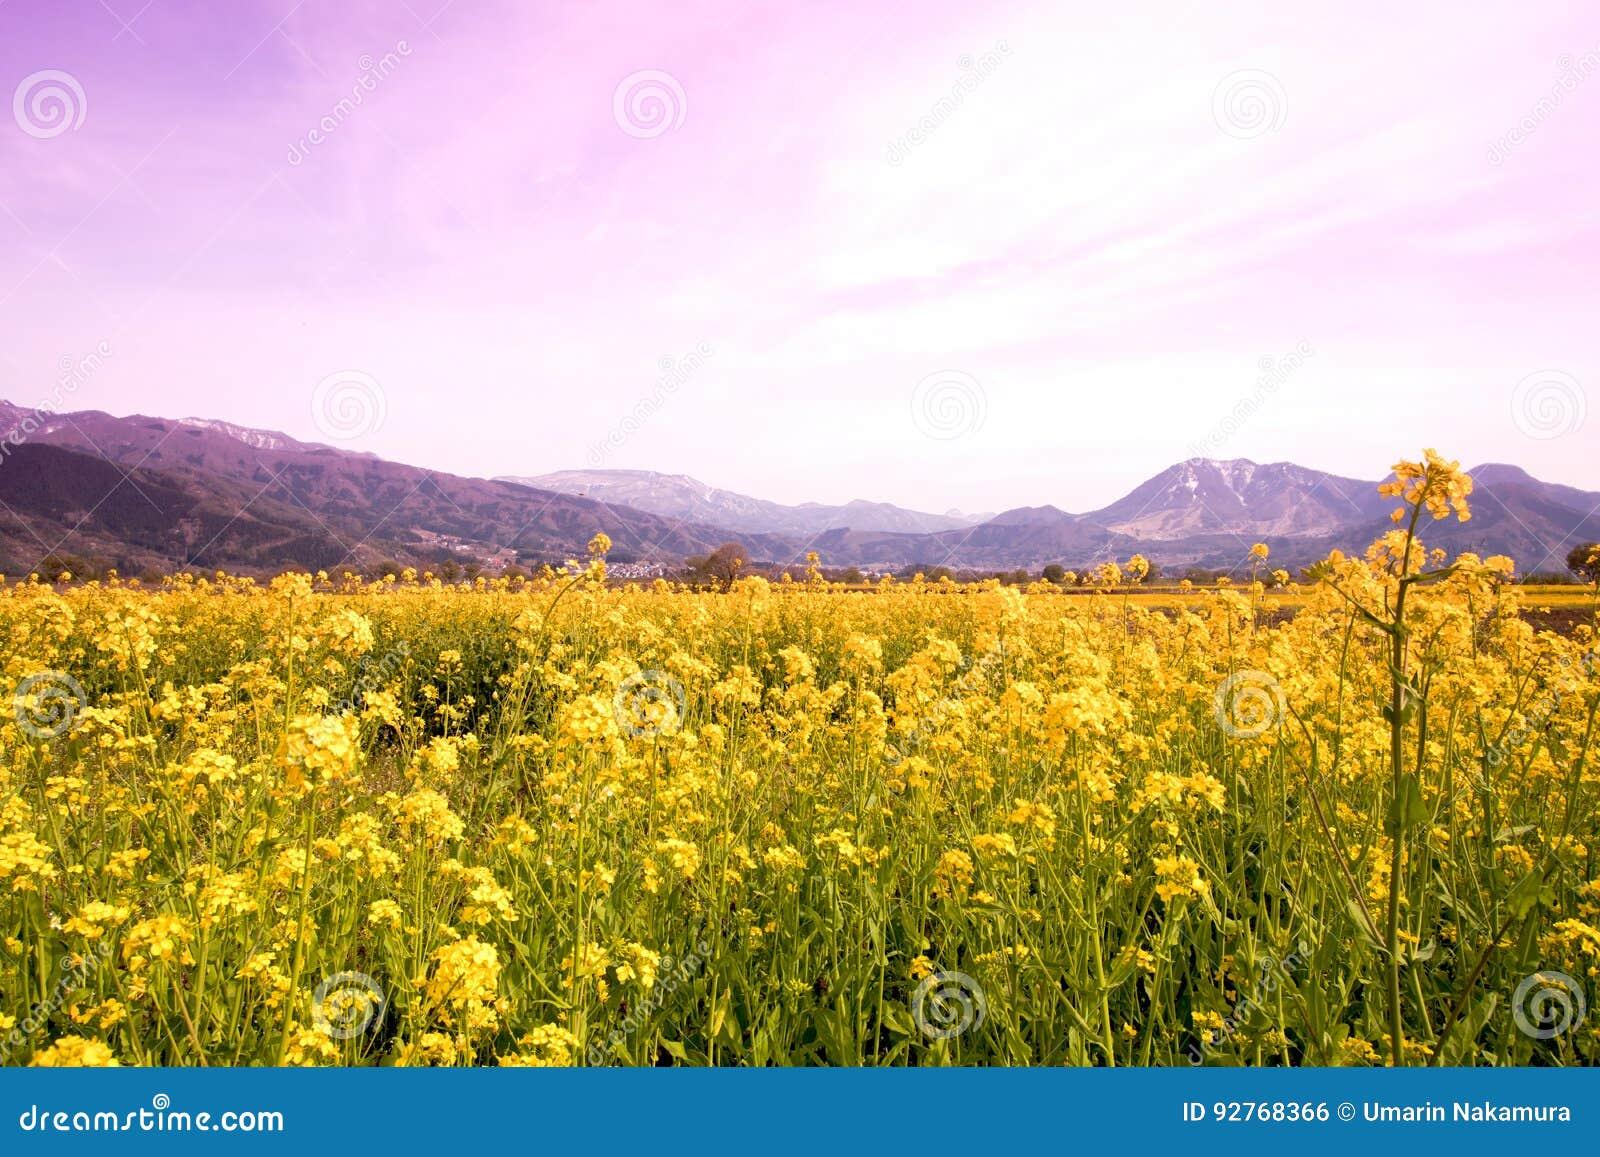 Nanohana Flowers In Japan Stock Photo Image Of Know 92768366